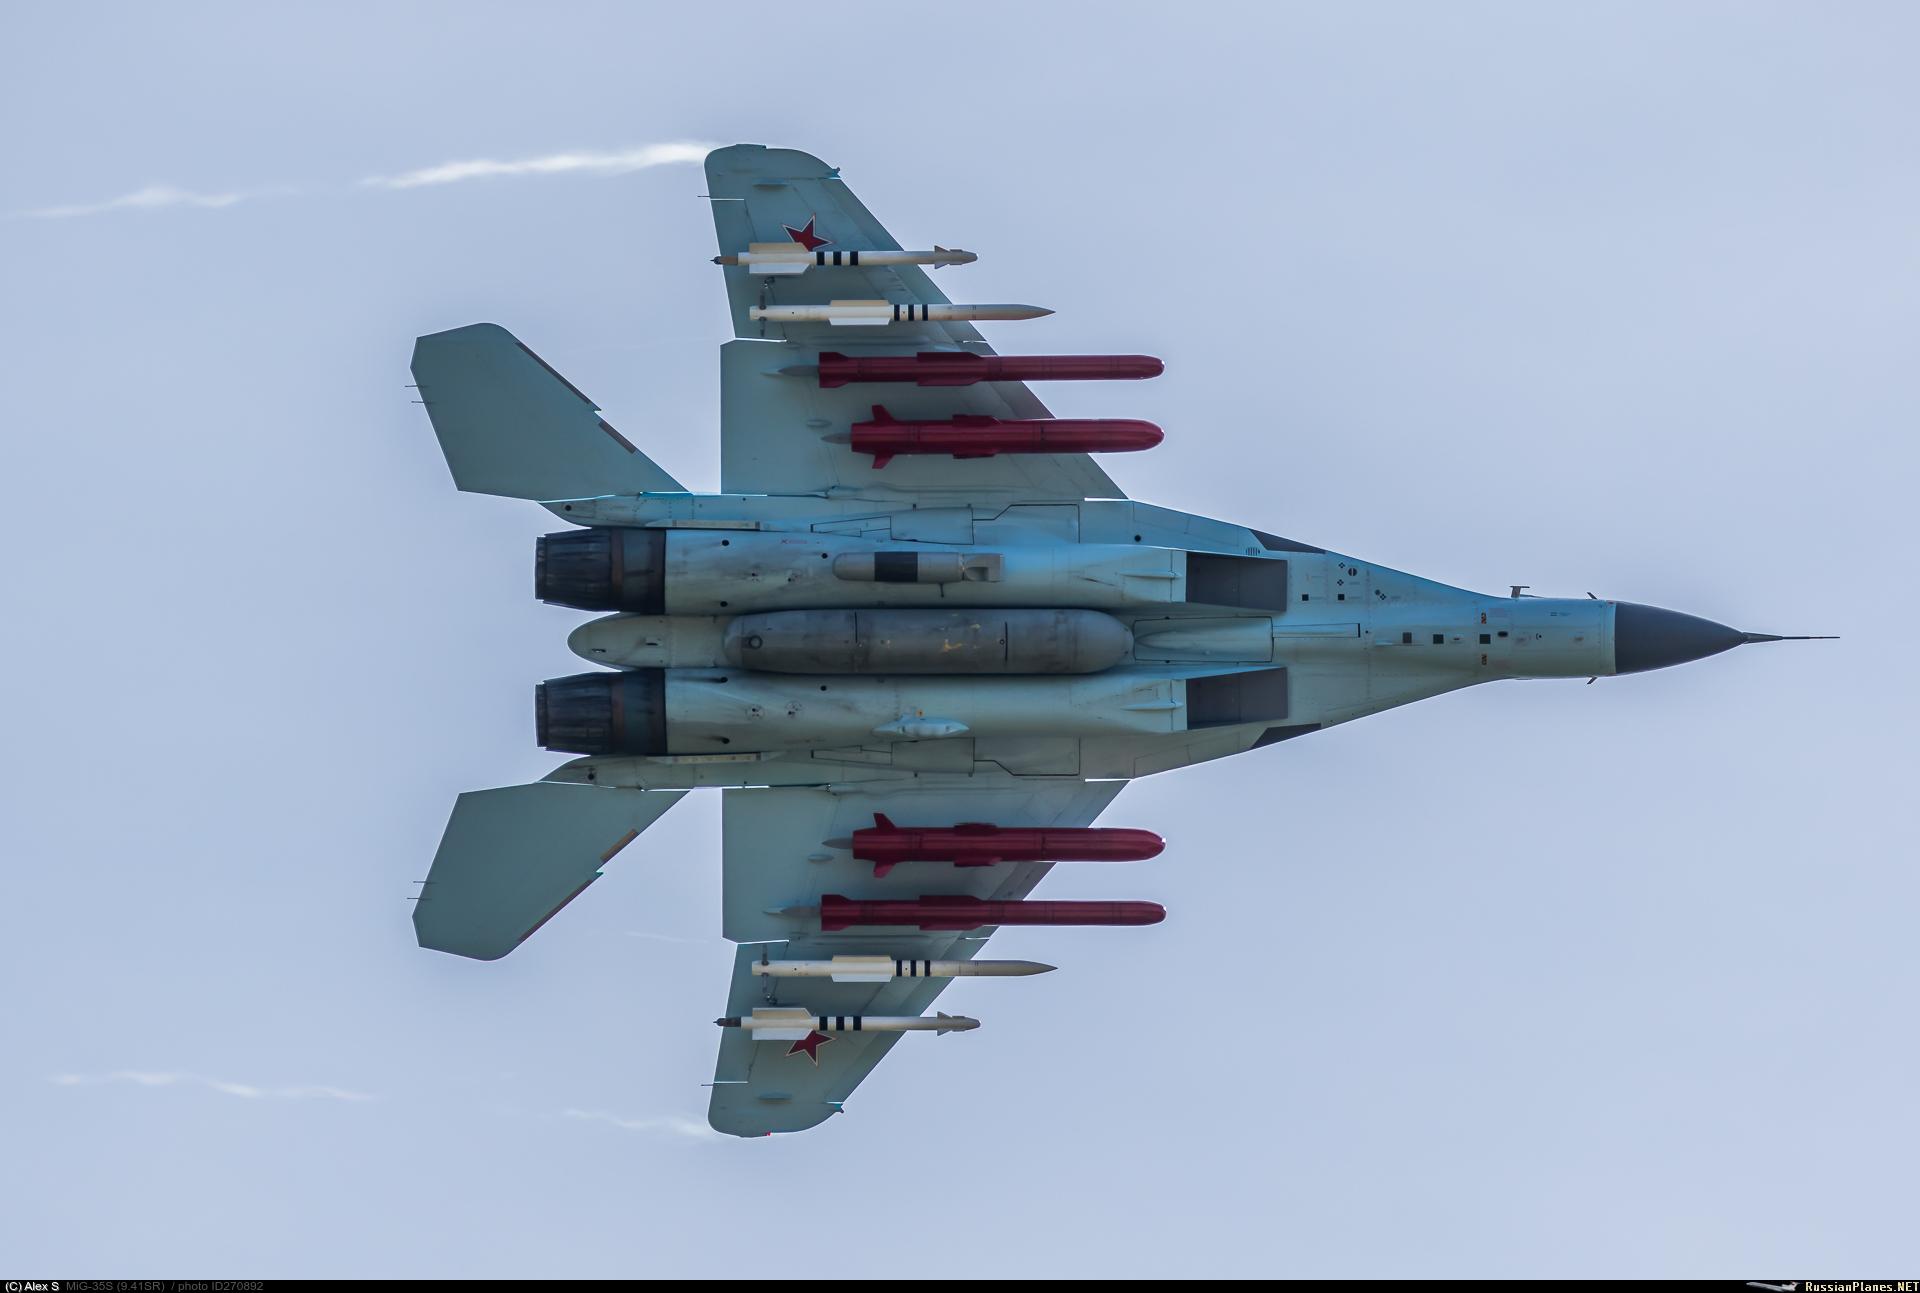 https://russianplanes.net/images/to271000/270892.jpg